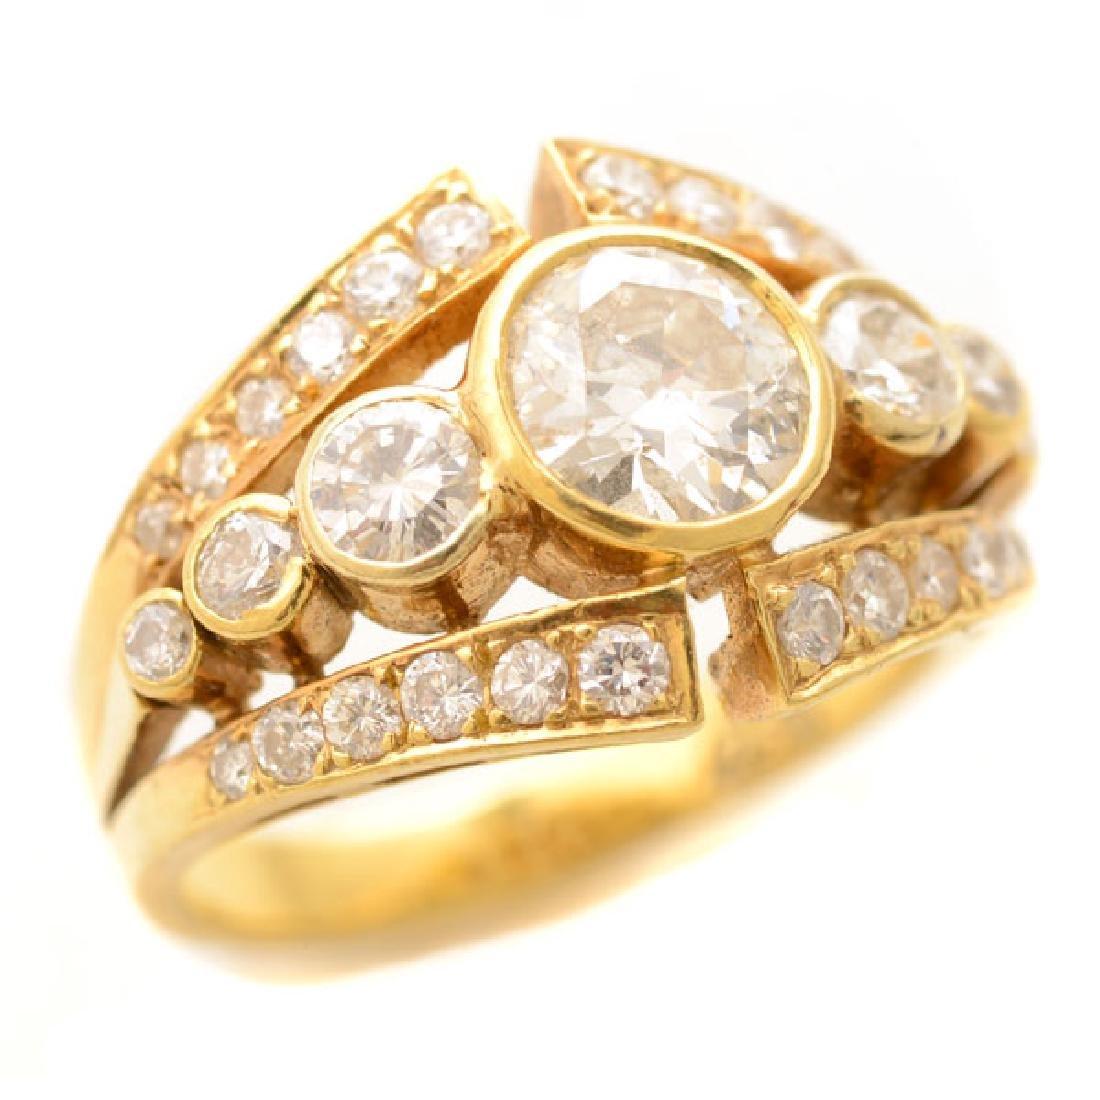 Diamond, 18k Yellow Gold Ring.